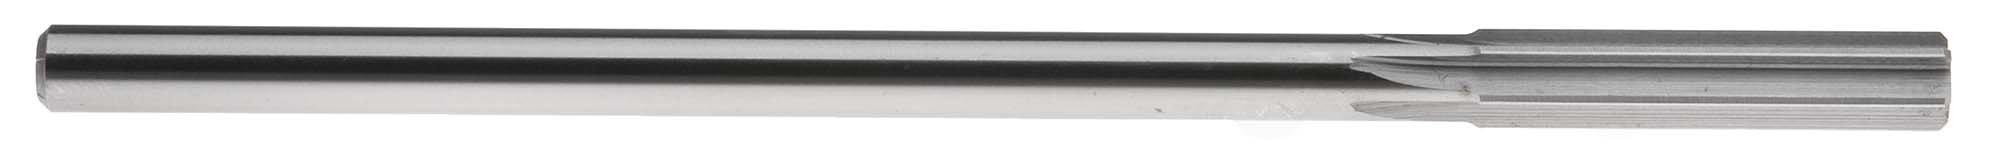 U (.368'') Straight Shank Chucking Reamer, Straight Flute, High Speed Steel